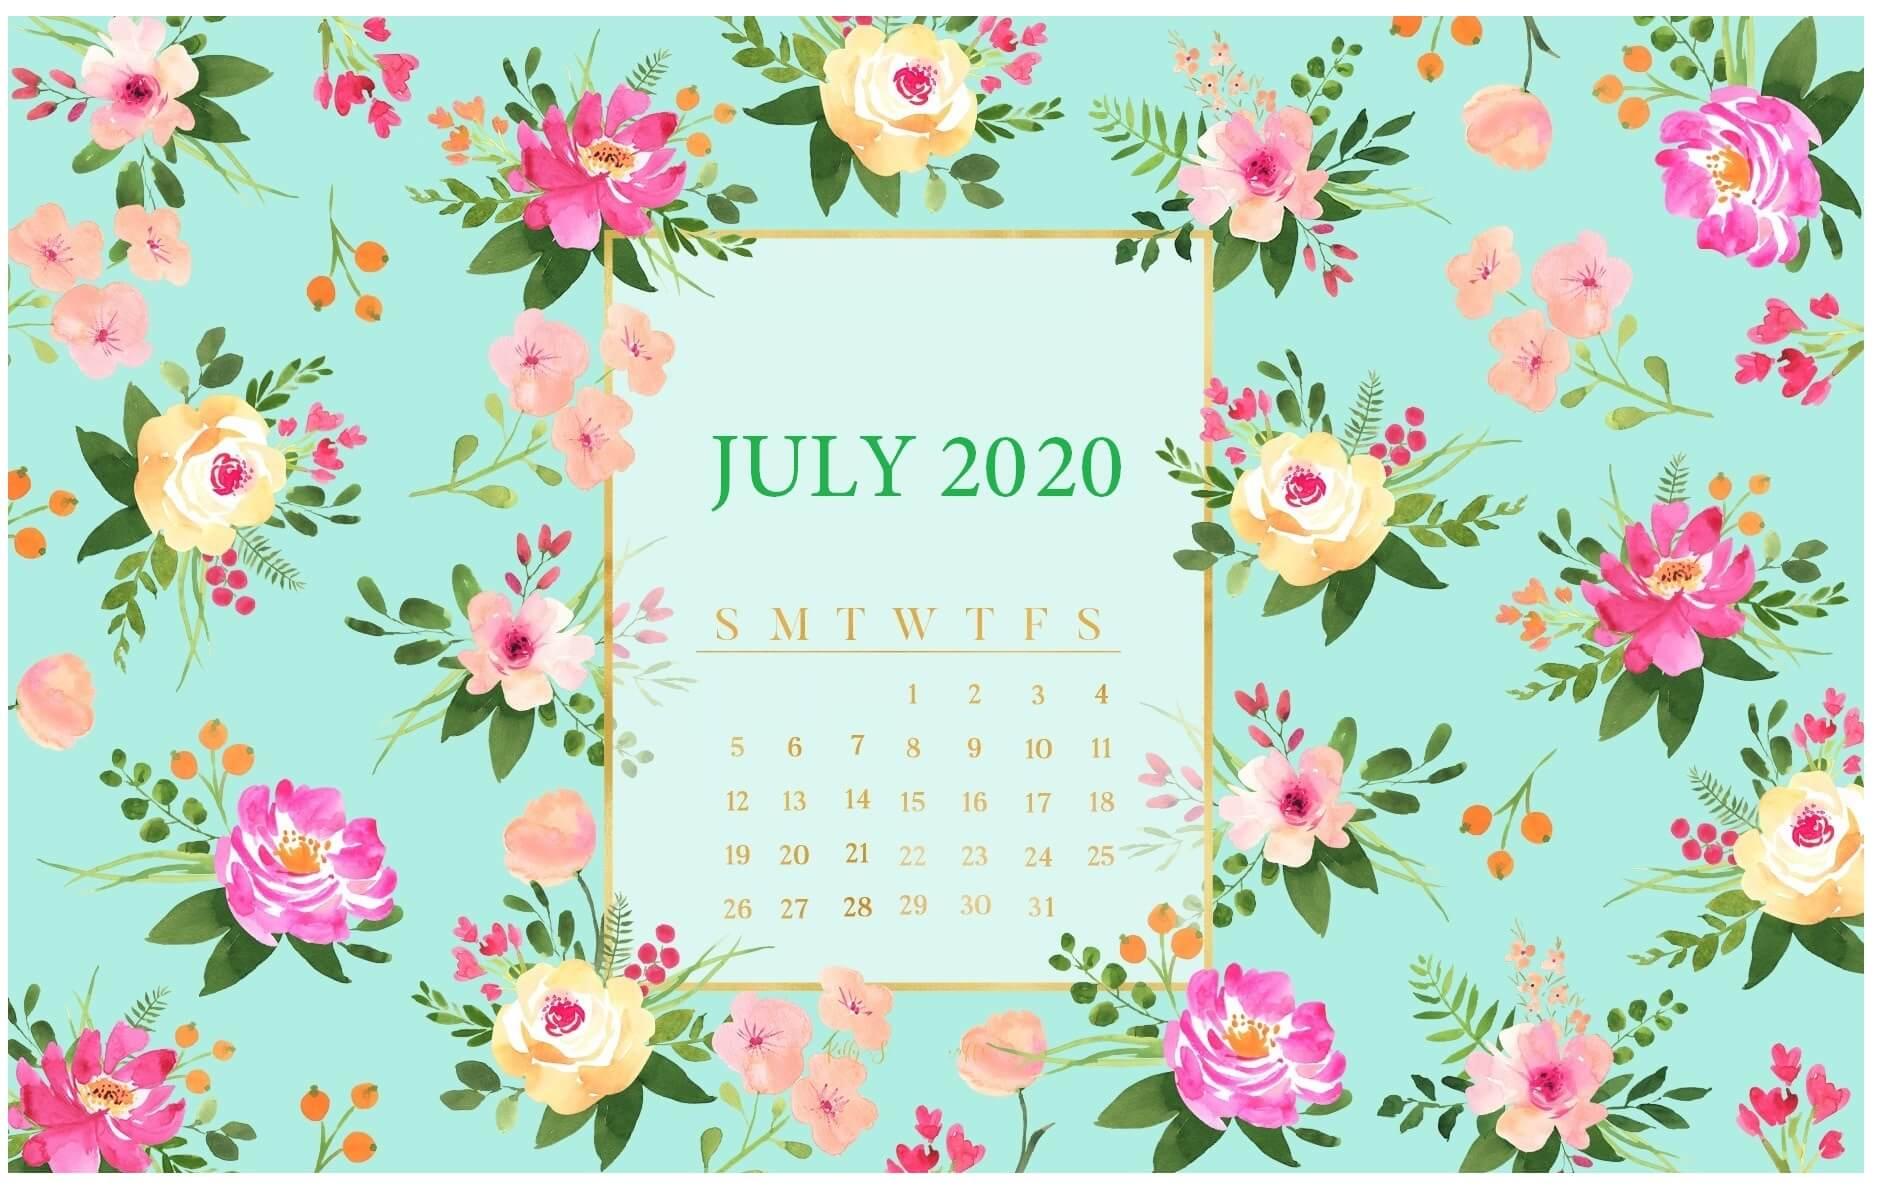 Floral July 2020 Calendar Wallpaper